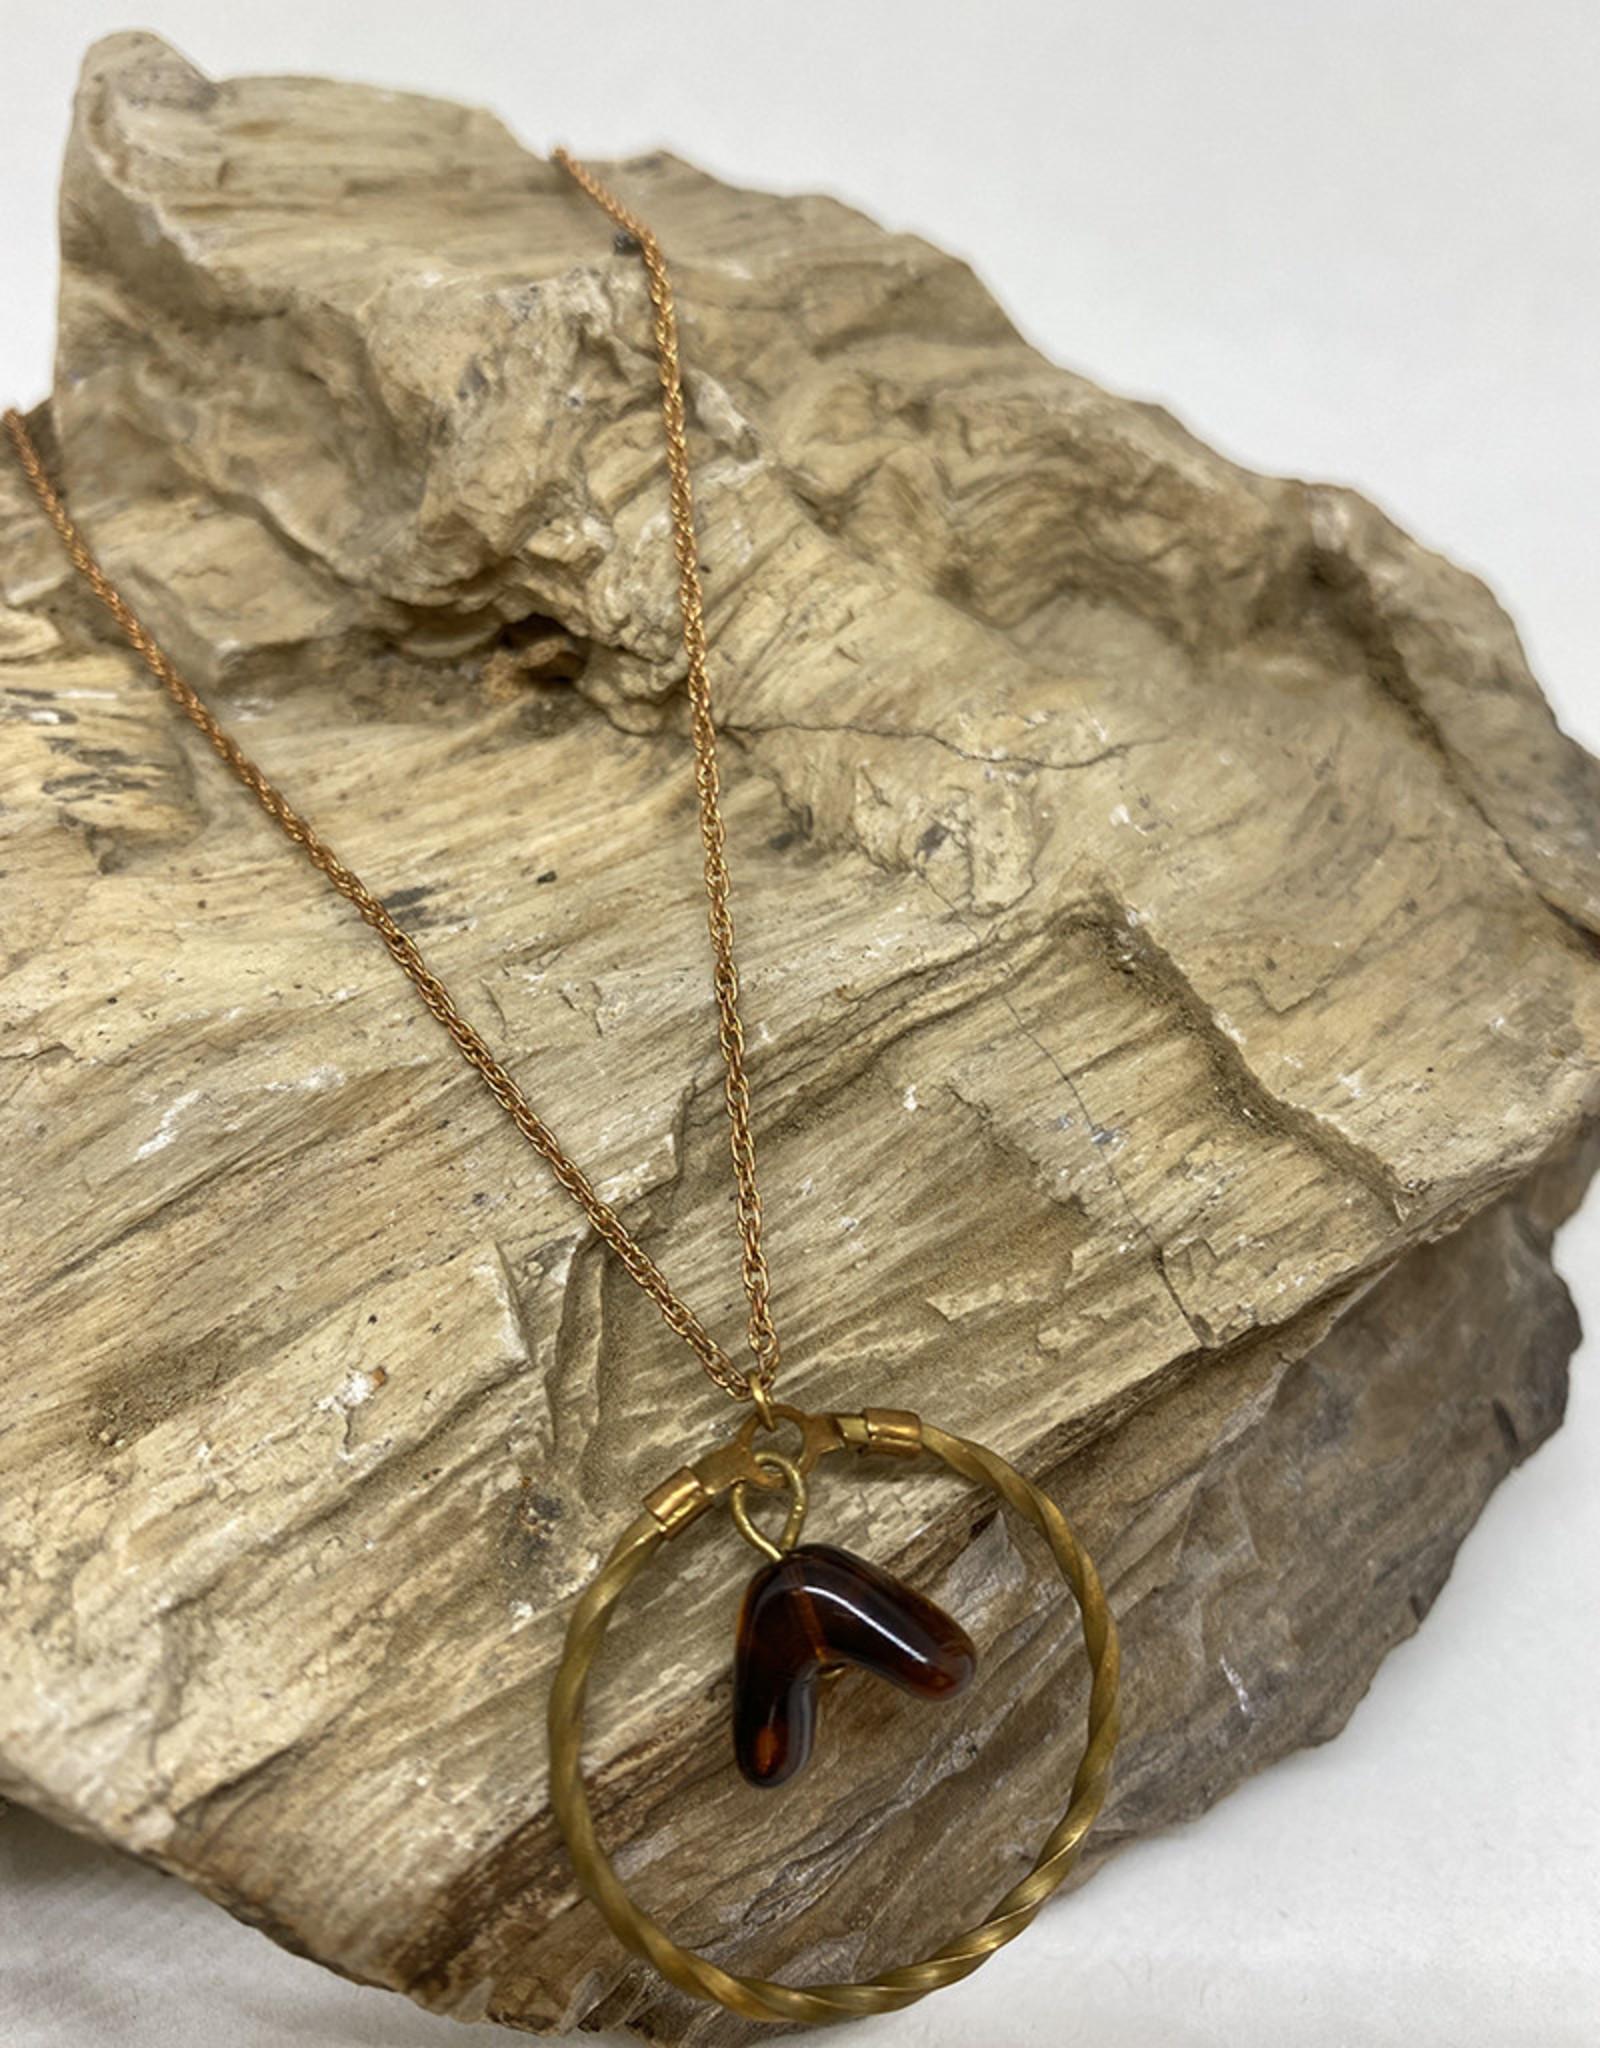 kizmet jewelry Tortoise Bead in Twisted Hoop Necklace by Kizmet Jewelry